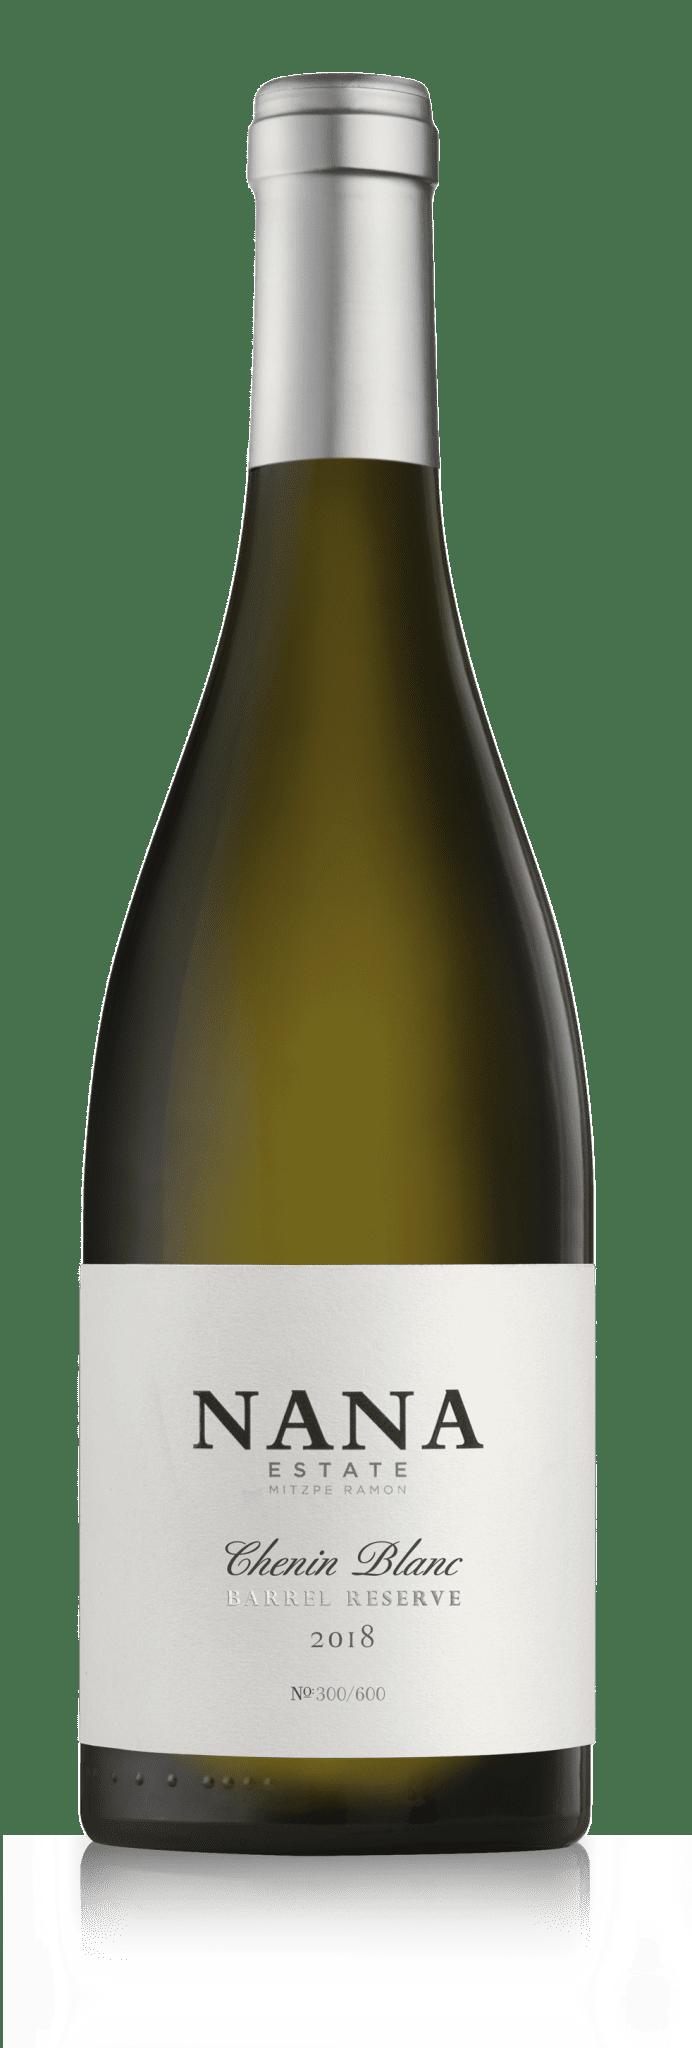 Chenin Blanc Barrel Reserve 2018-750ml